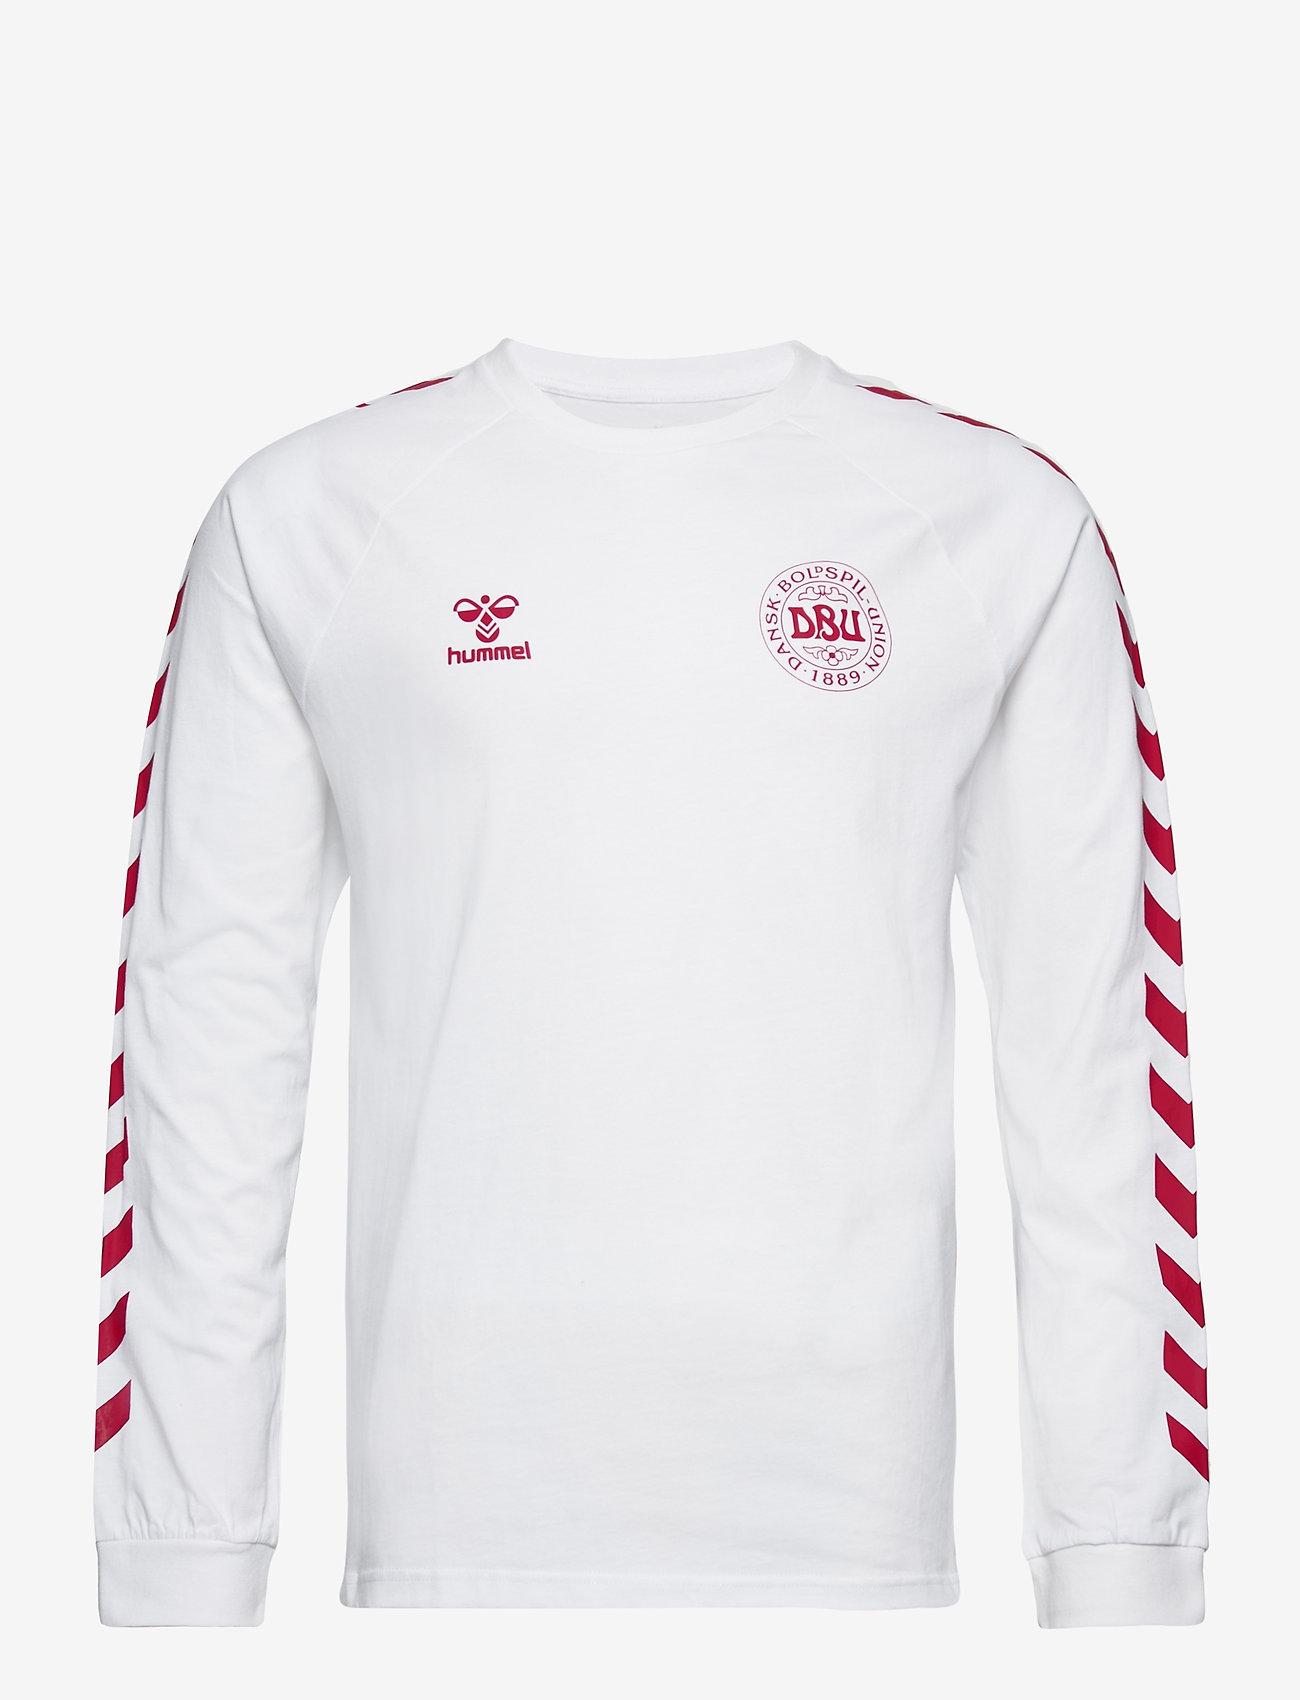 Hummel - DBU FAN 2020 COT. TEE L/S - football shirts - white - 0